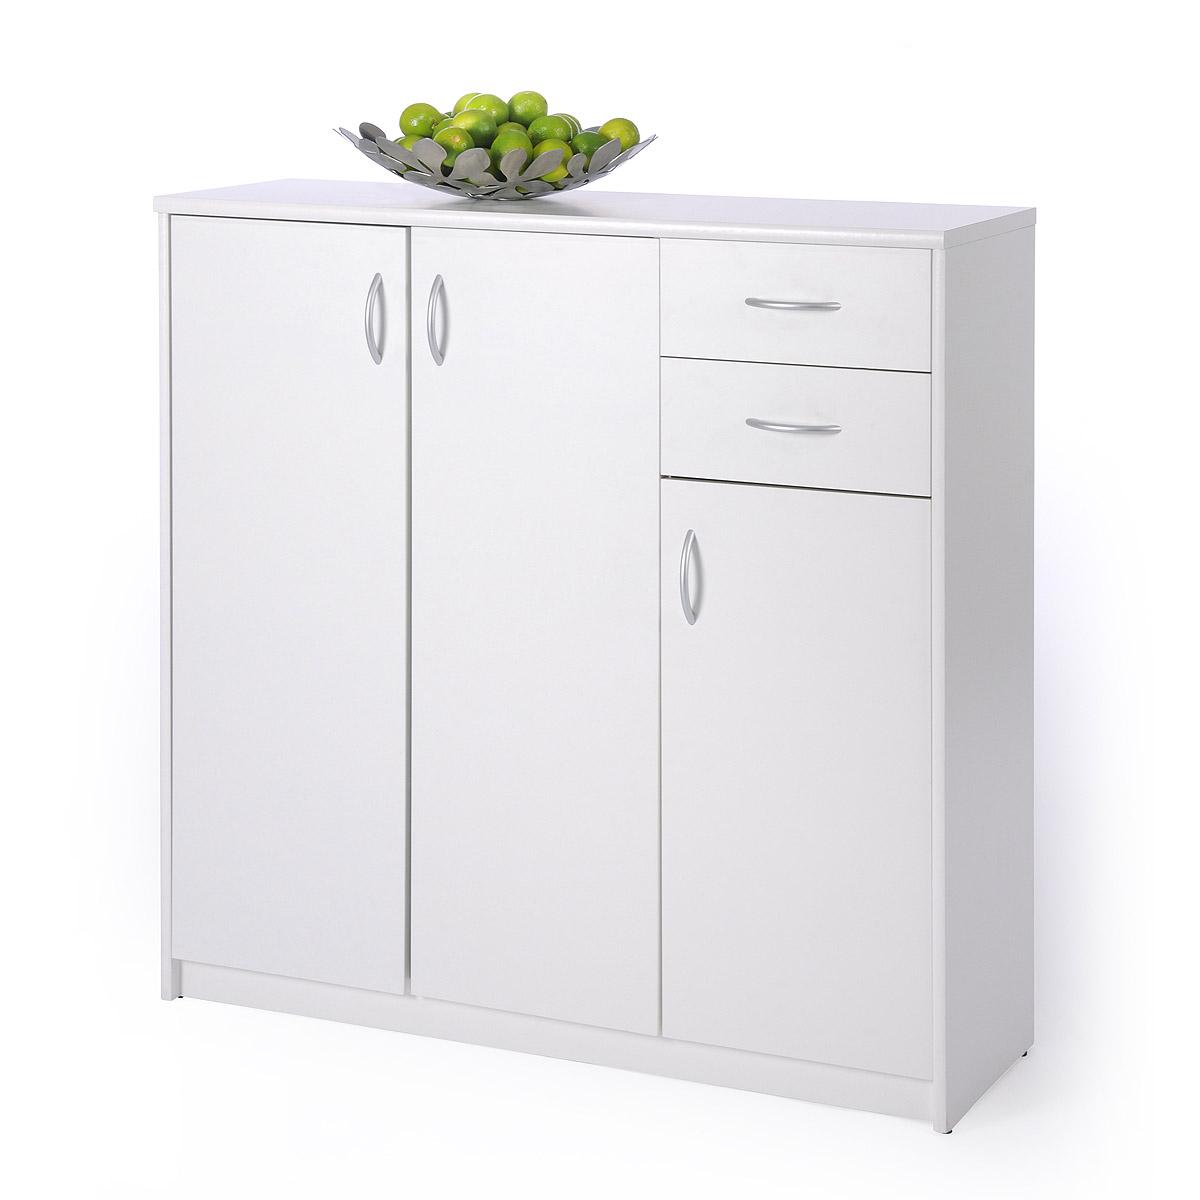 ikea highboard kommode interessante ideen f r die gestaltung eines raumes in. Black Bedroom Furniture Sets. Home Design Ideas